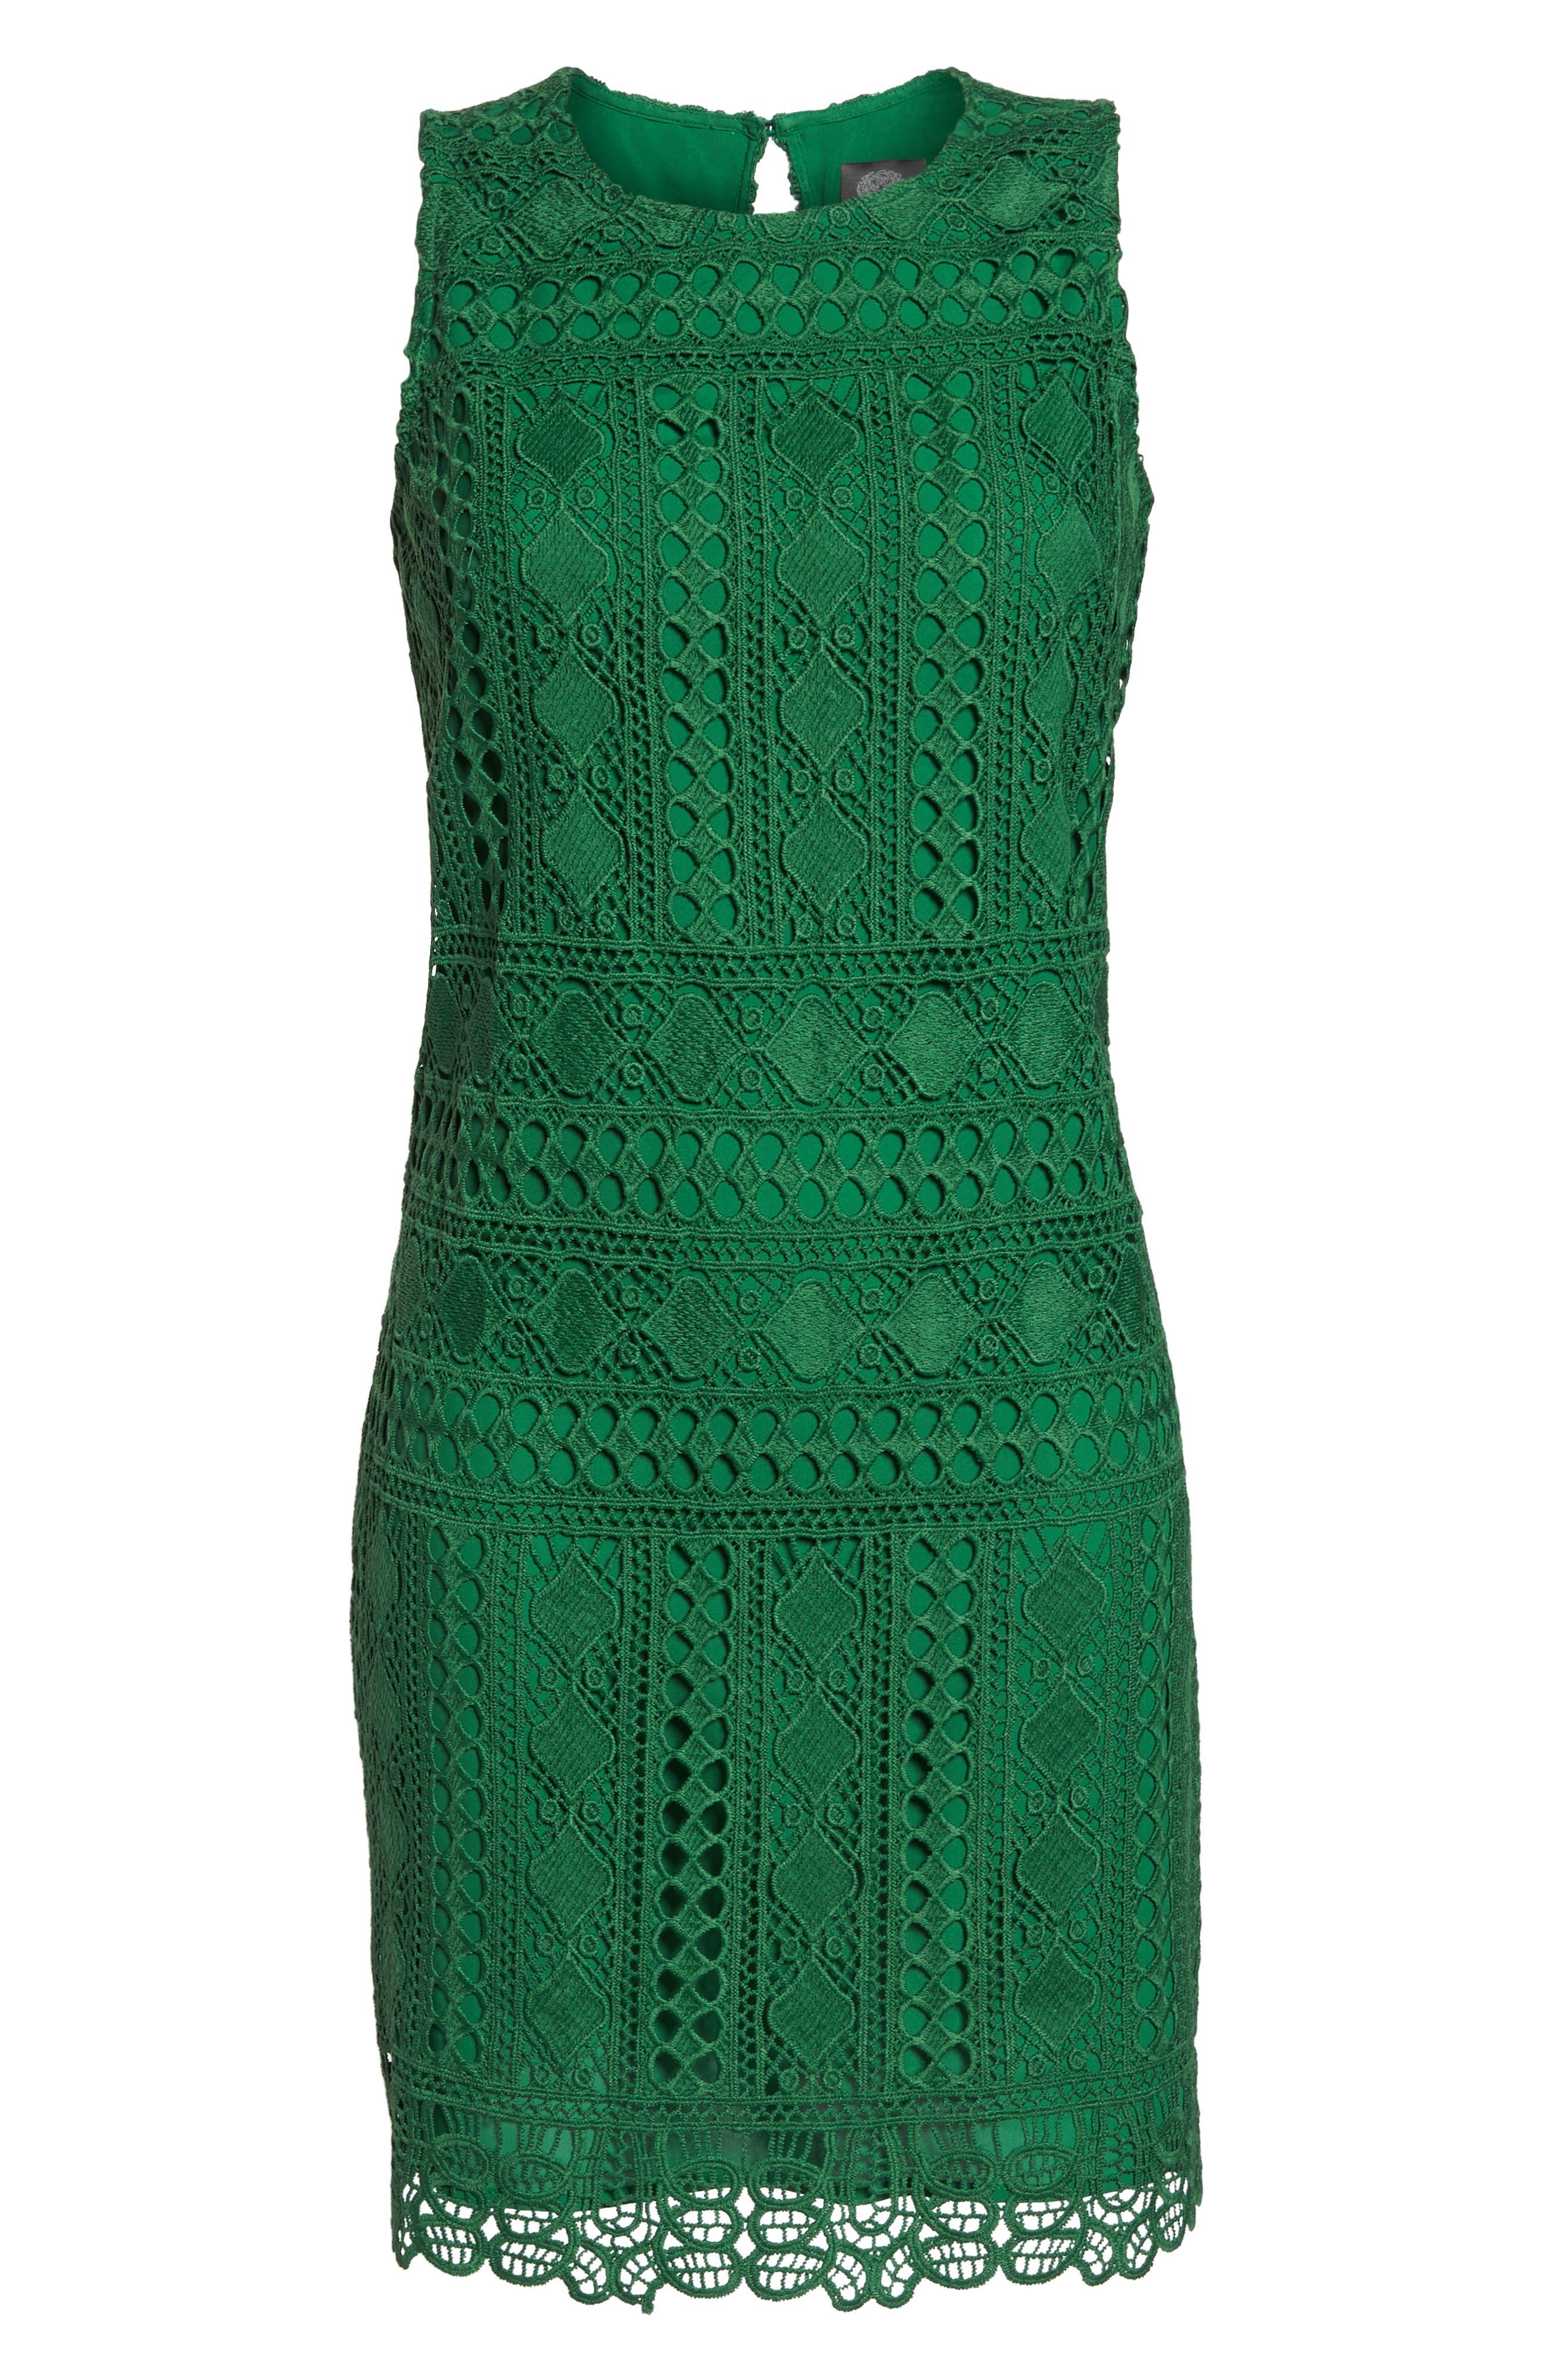 Lace Sheath Dress,                             Alternate thumbnail 7, color,                             310